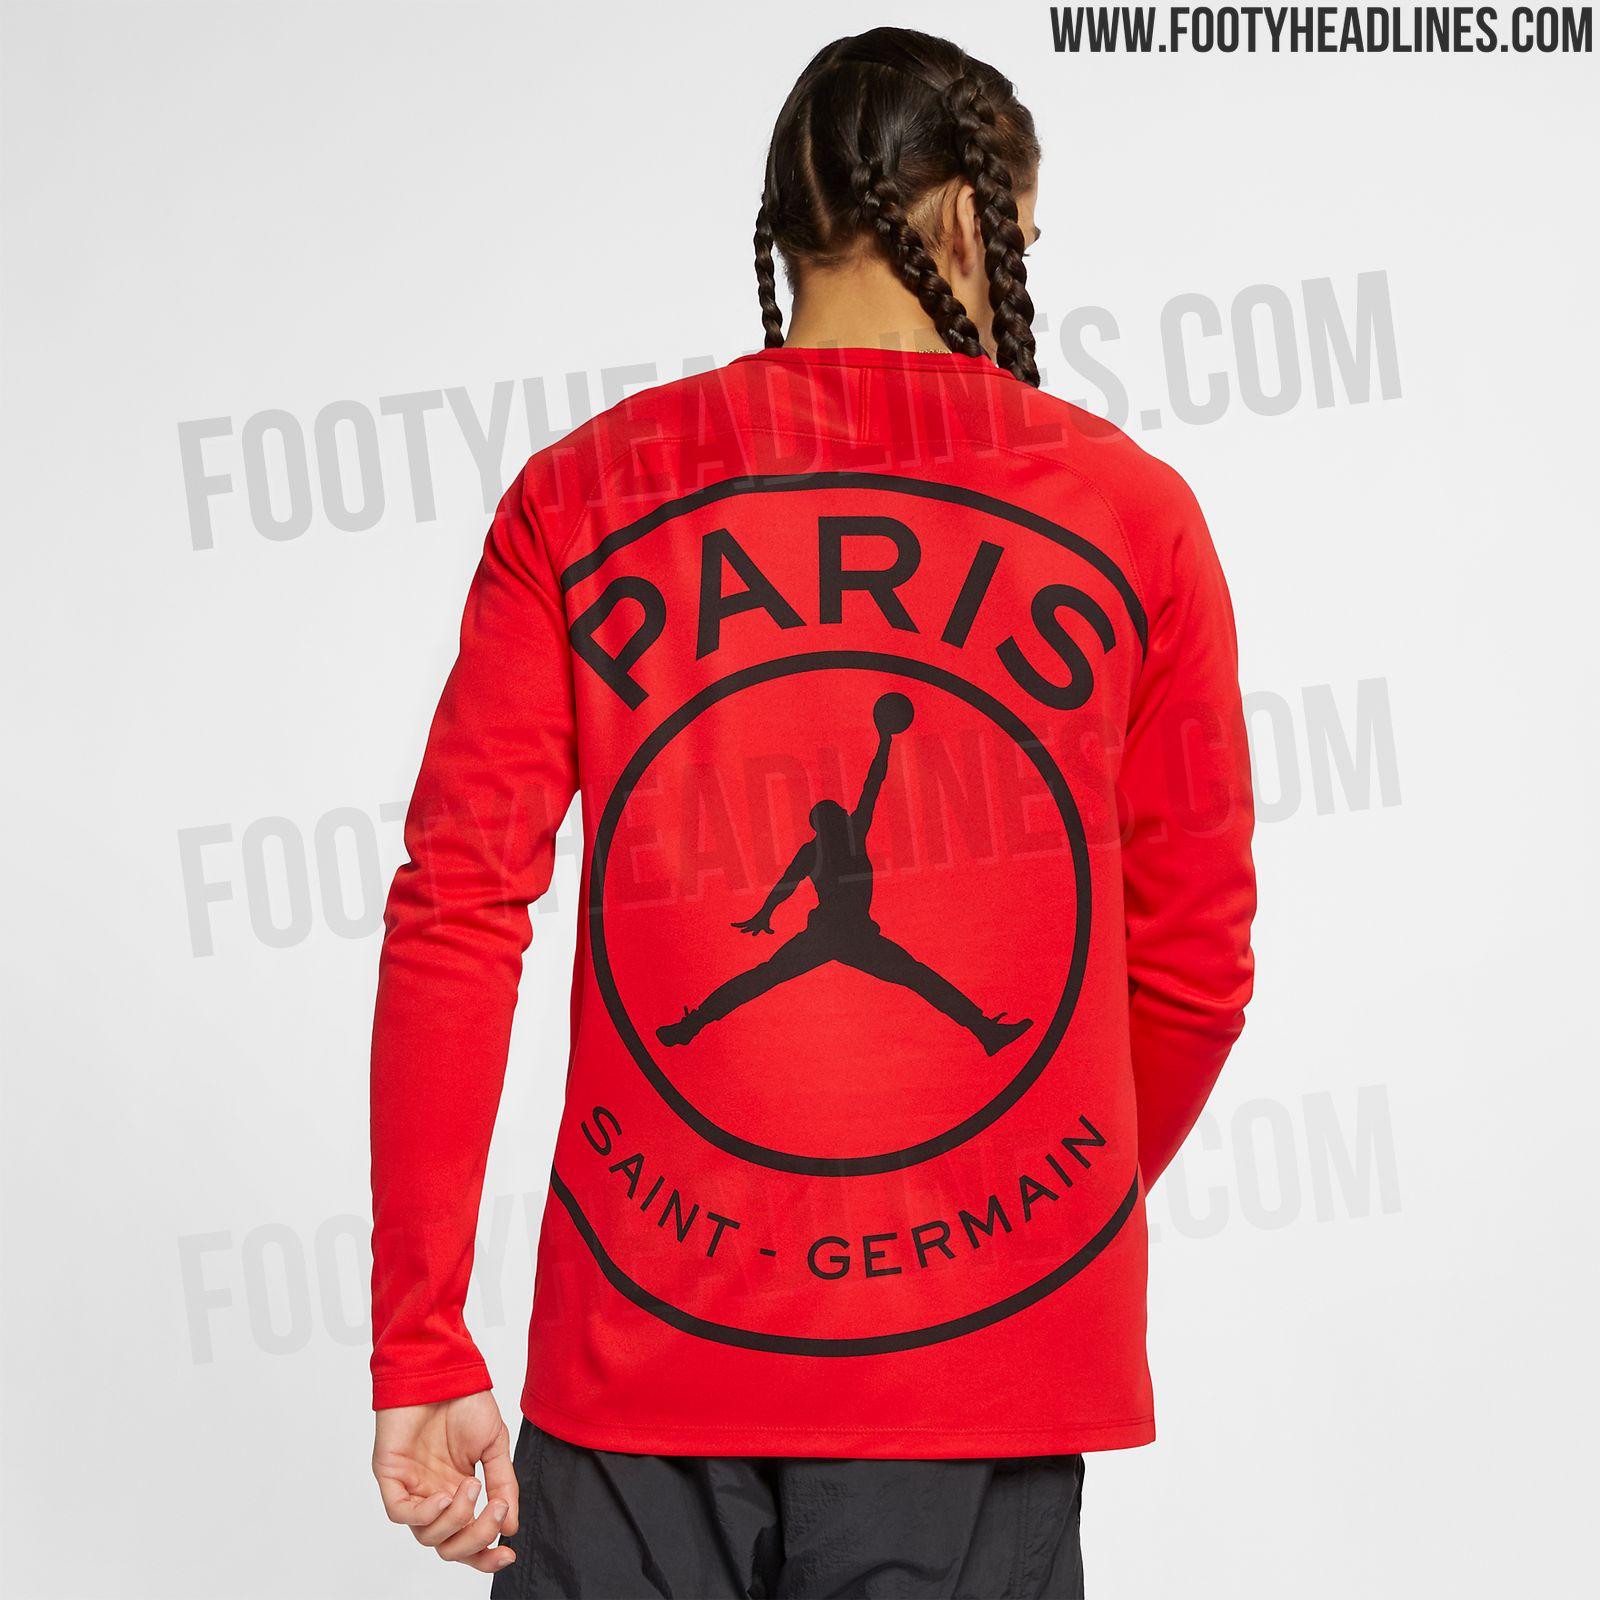 new product b4aab 22440 New Red/Black Jordan PSG 2019 Squad Top Leaked   Futbolgrid